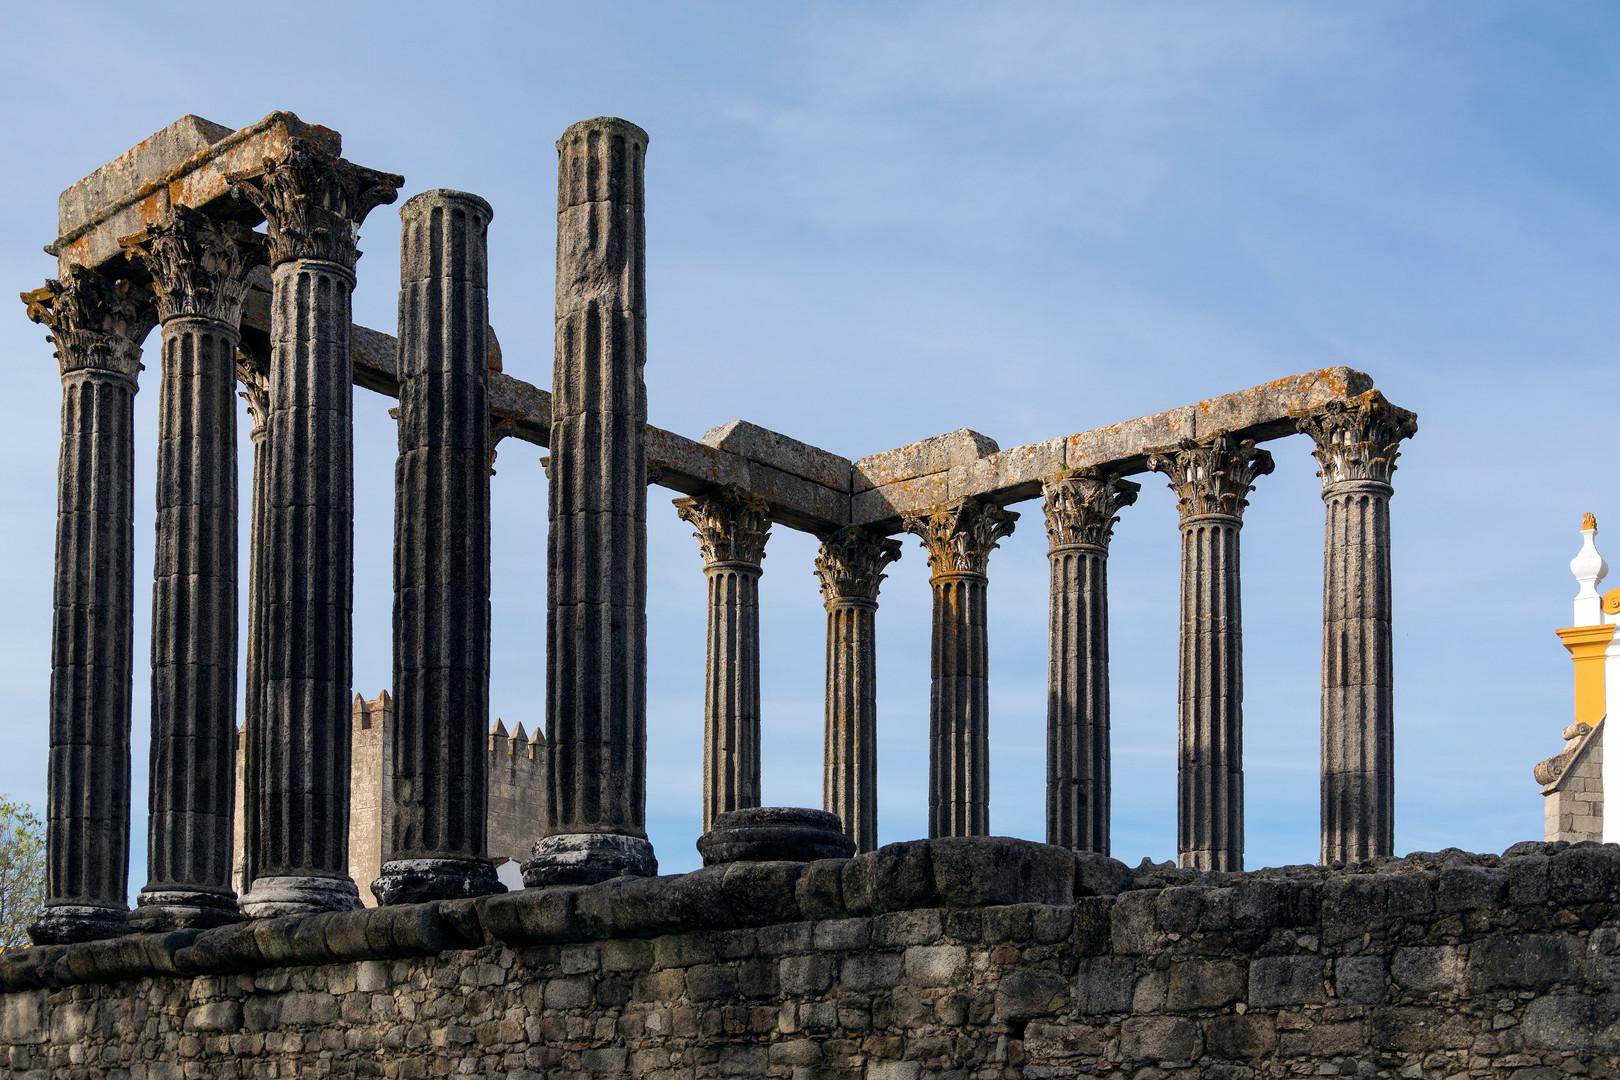 the-roman-temple-in-the-city-of-evora-in